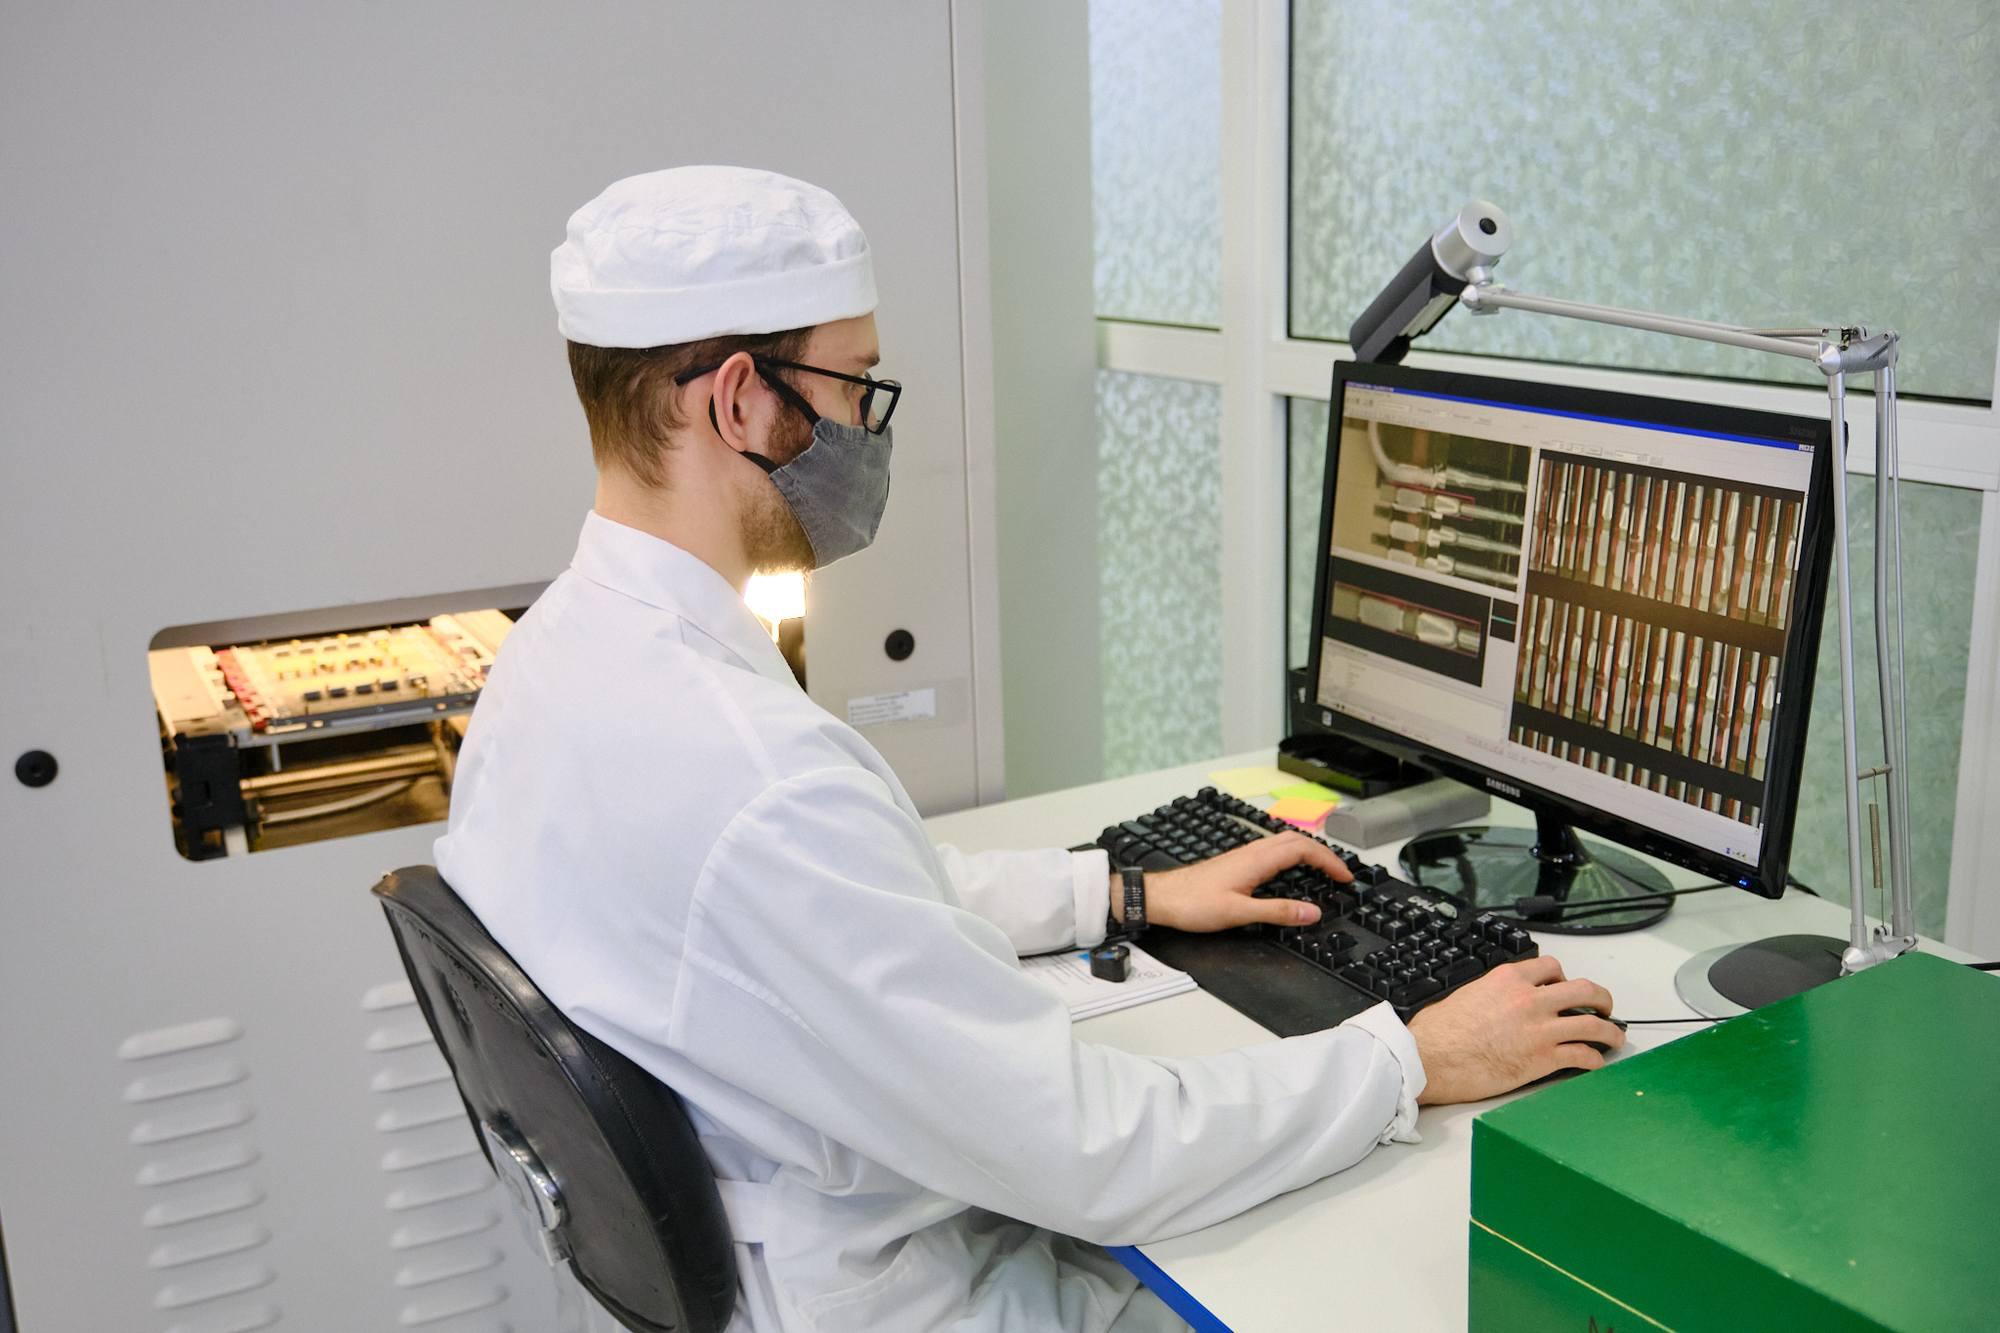 Vérification des circuits électroniques chez NPO Avtomatiki.